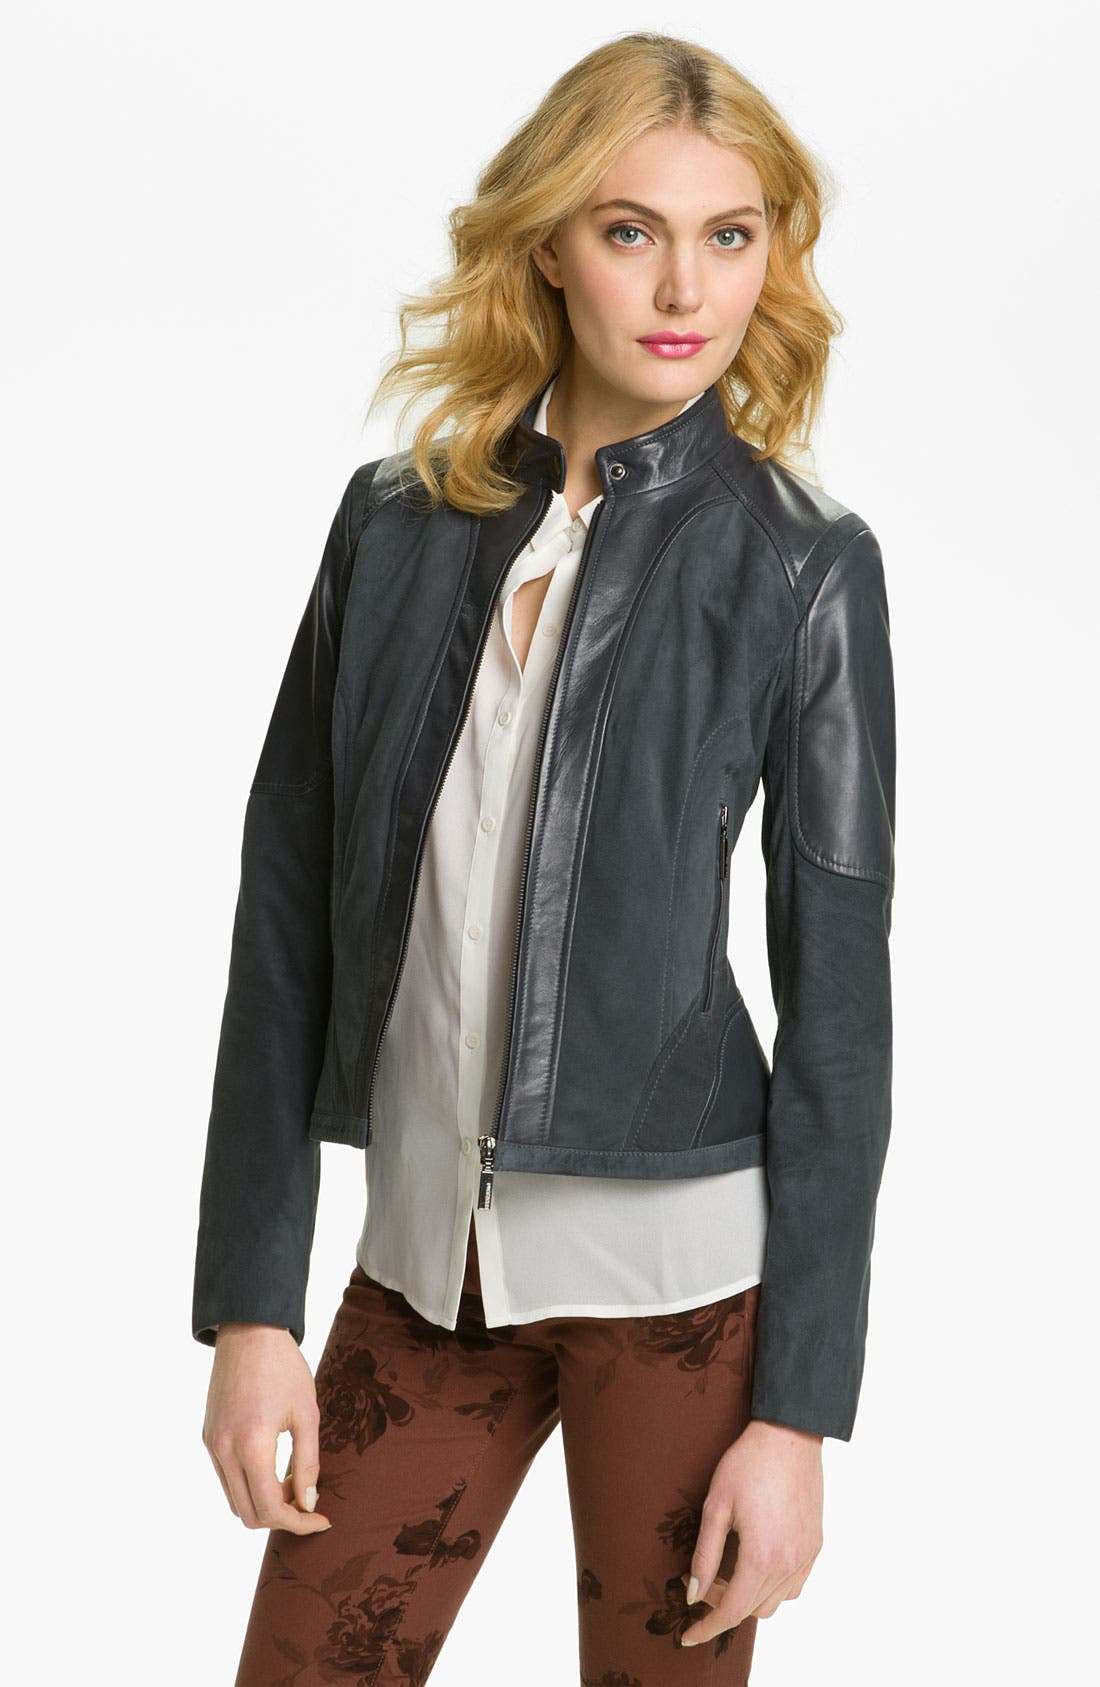 Alternate Image 1 Selected - Bernardo Suede Marble Leather Jacket